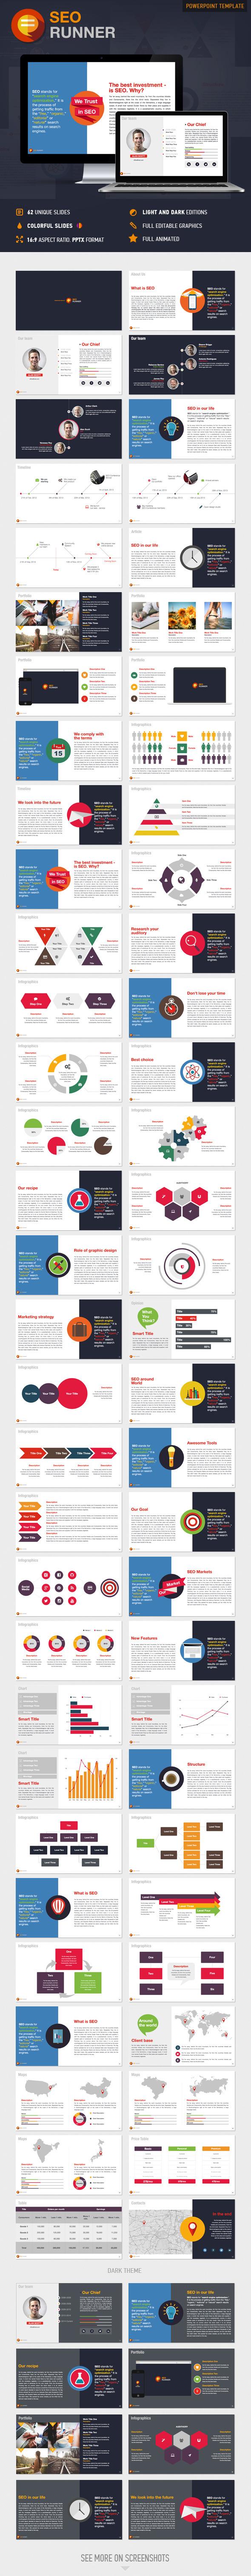 SEO Runner PowerPoint Presentation Template - Business PowerPoint Templates